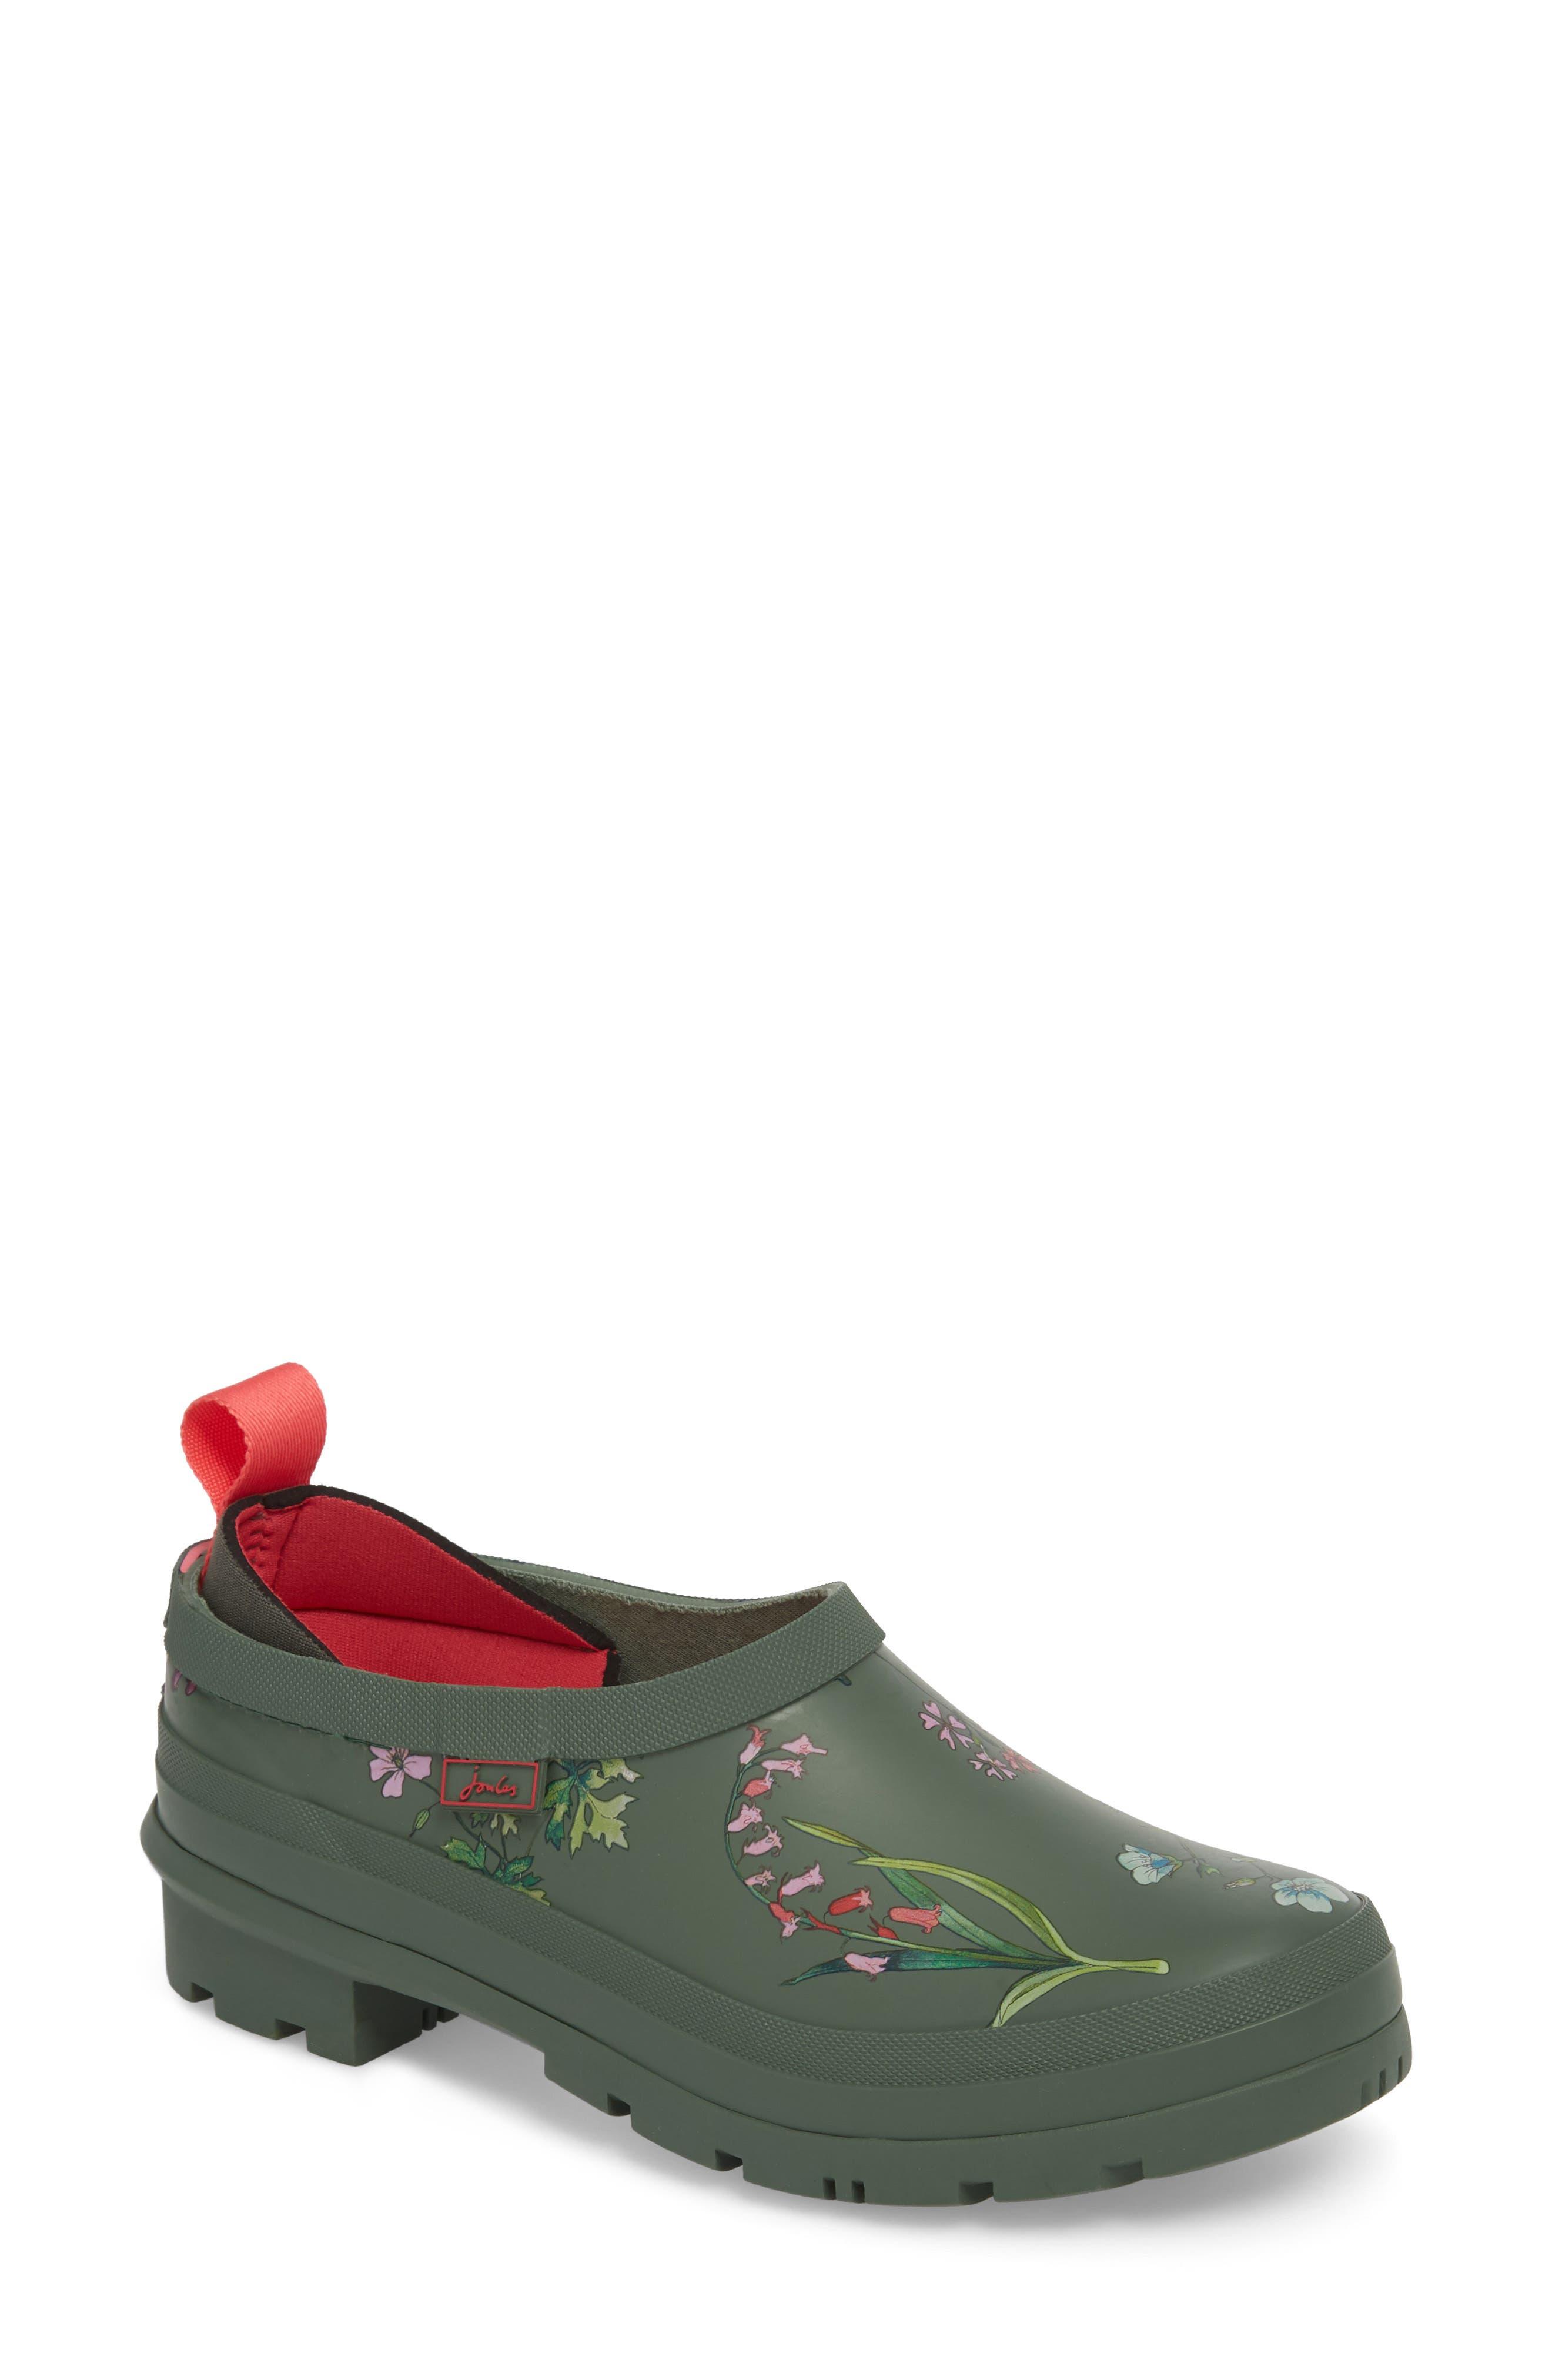 Rain Boot Clog,                             Main thumbnail 1, color,                             Laurel Botanical